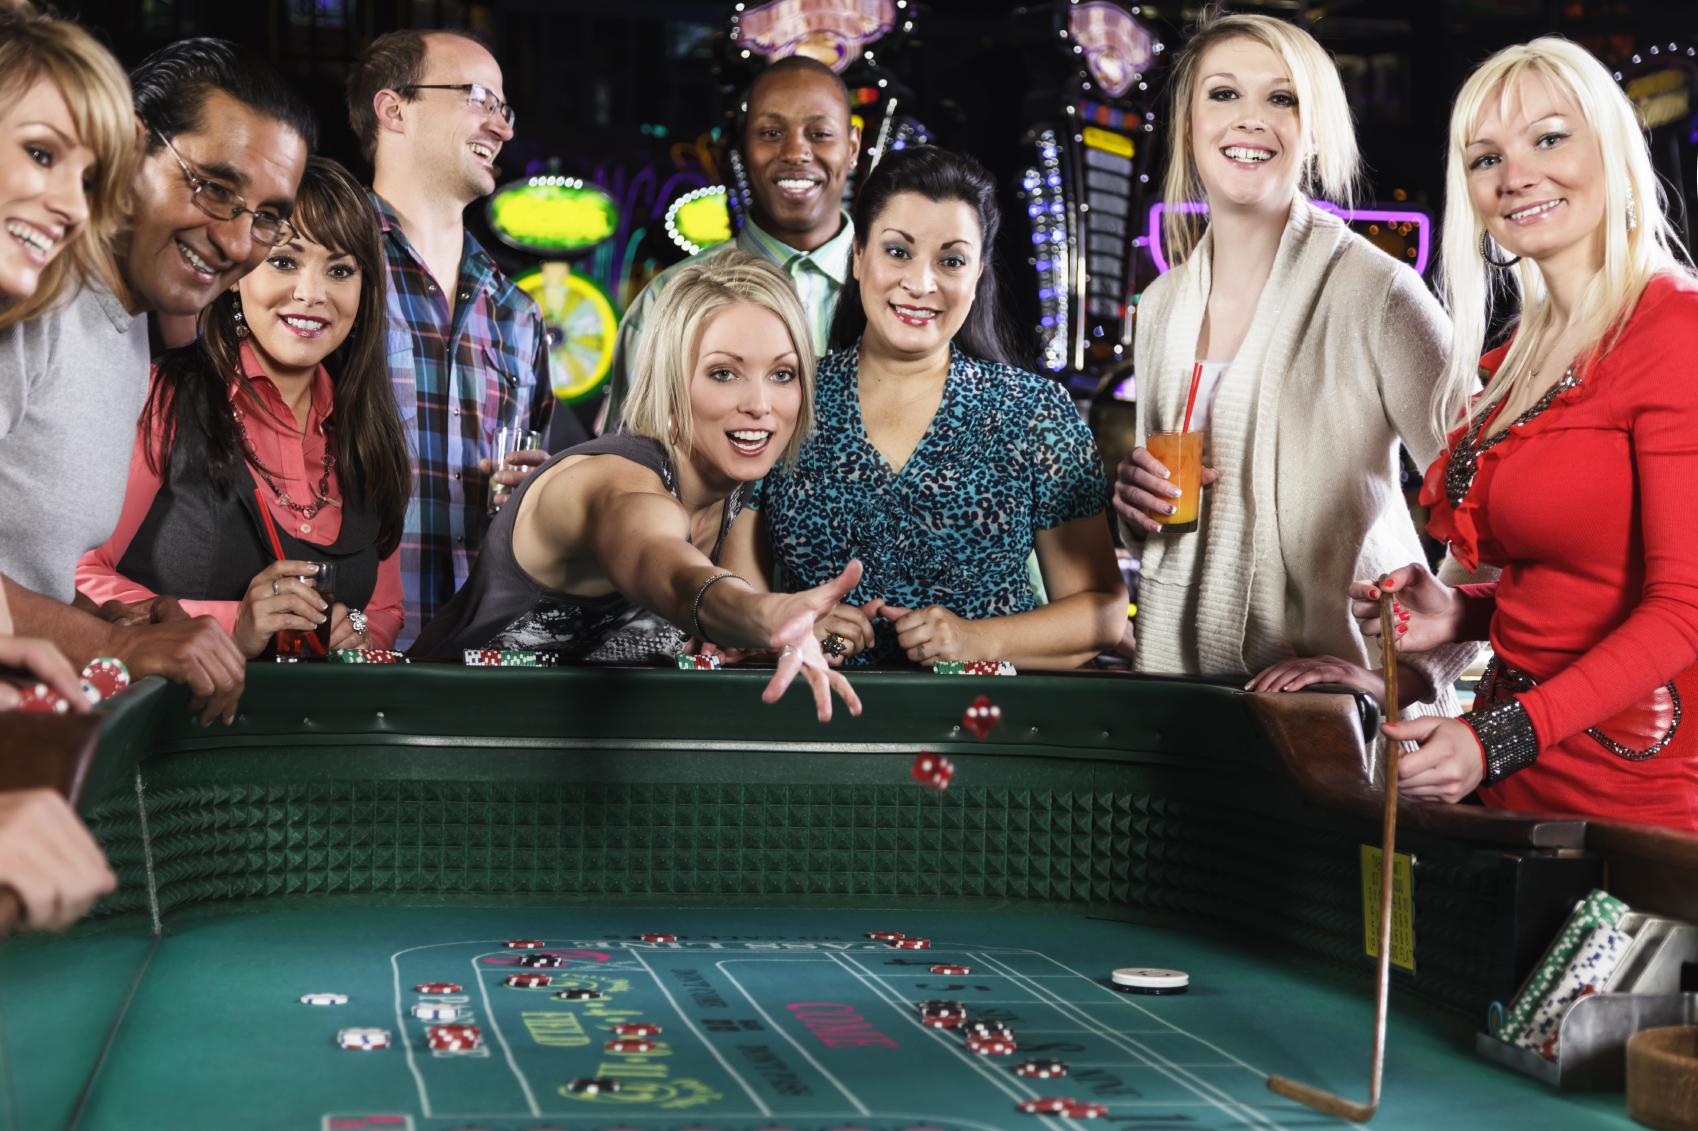 Casino monte carlo online confiable São Paulo 237959